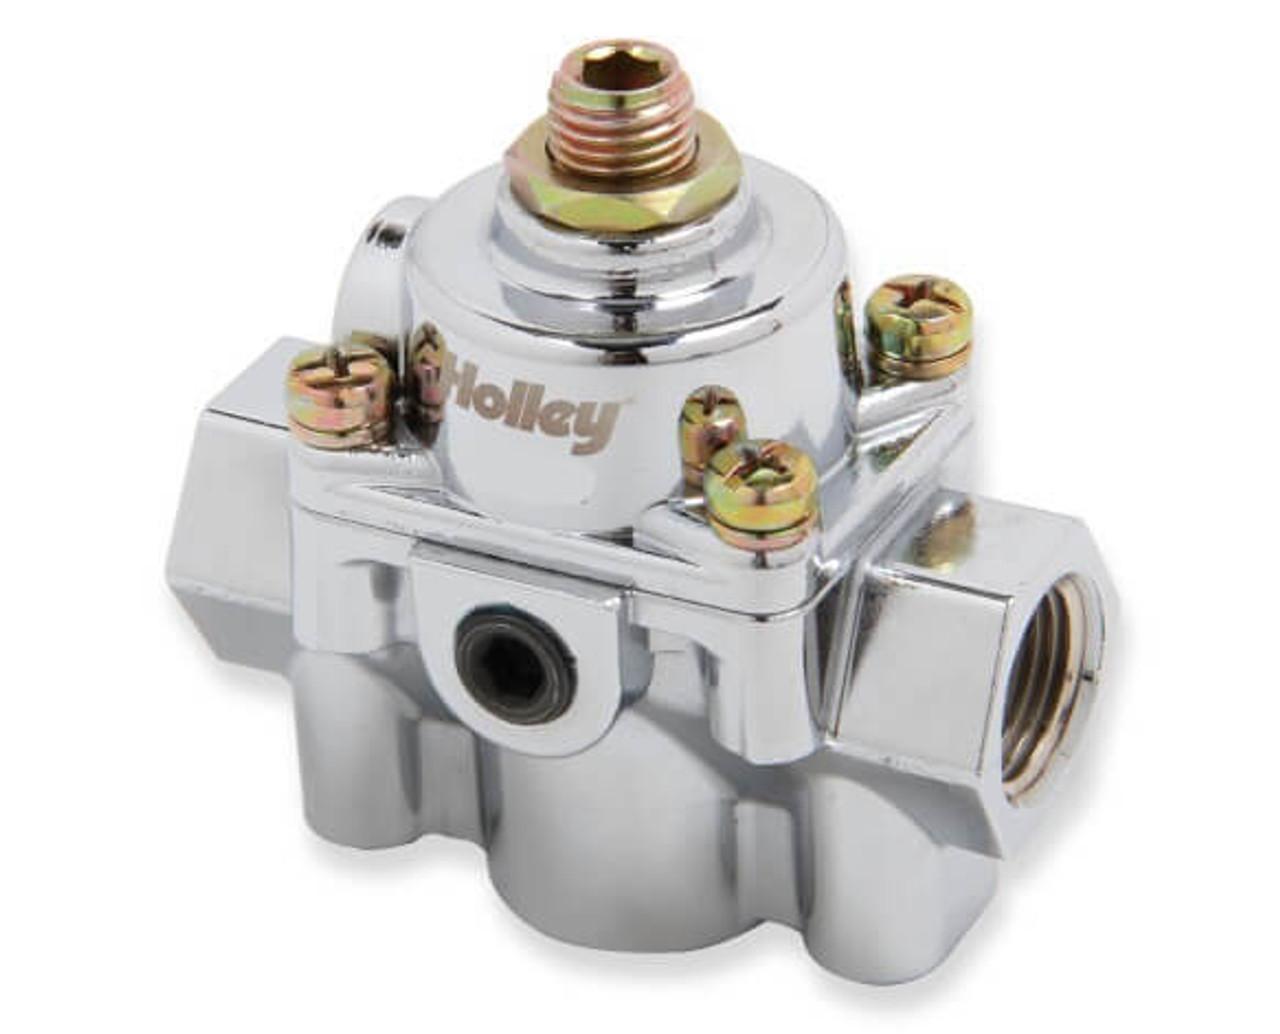 Holley 12-882 Die cast by pass style EFI fuel pressure regulator.